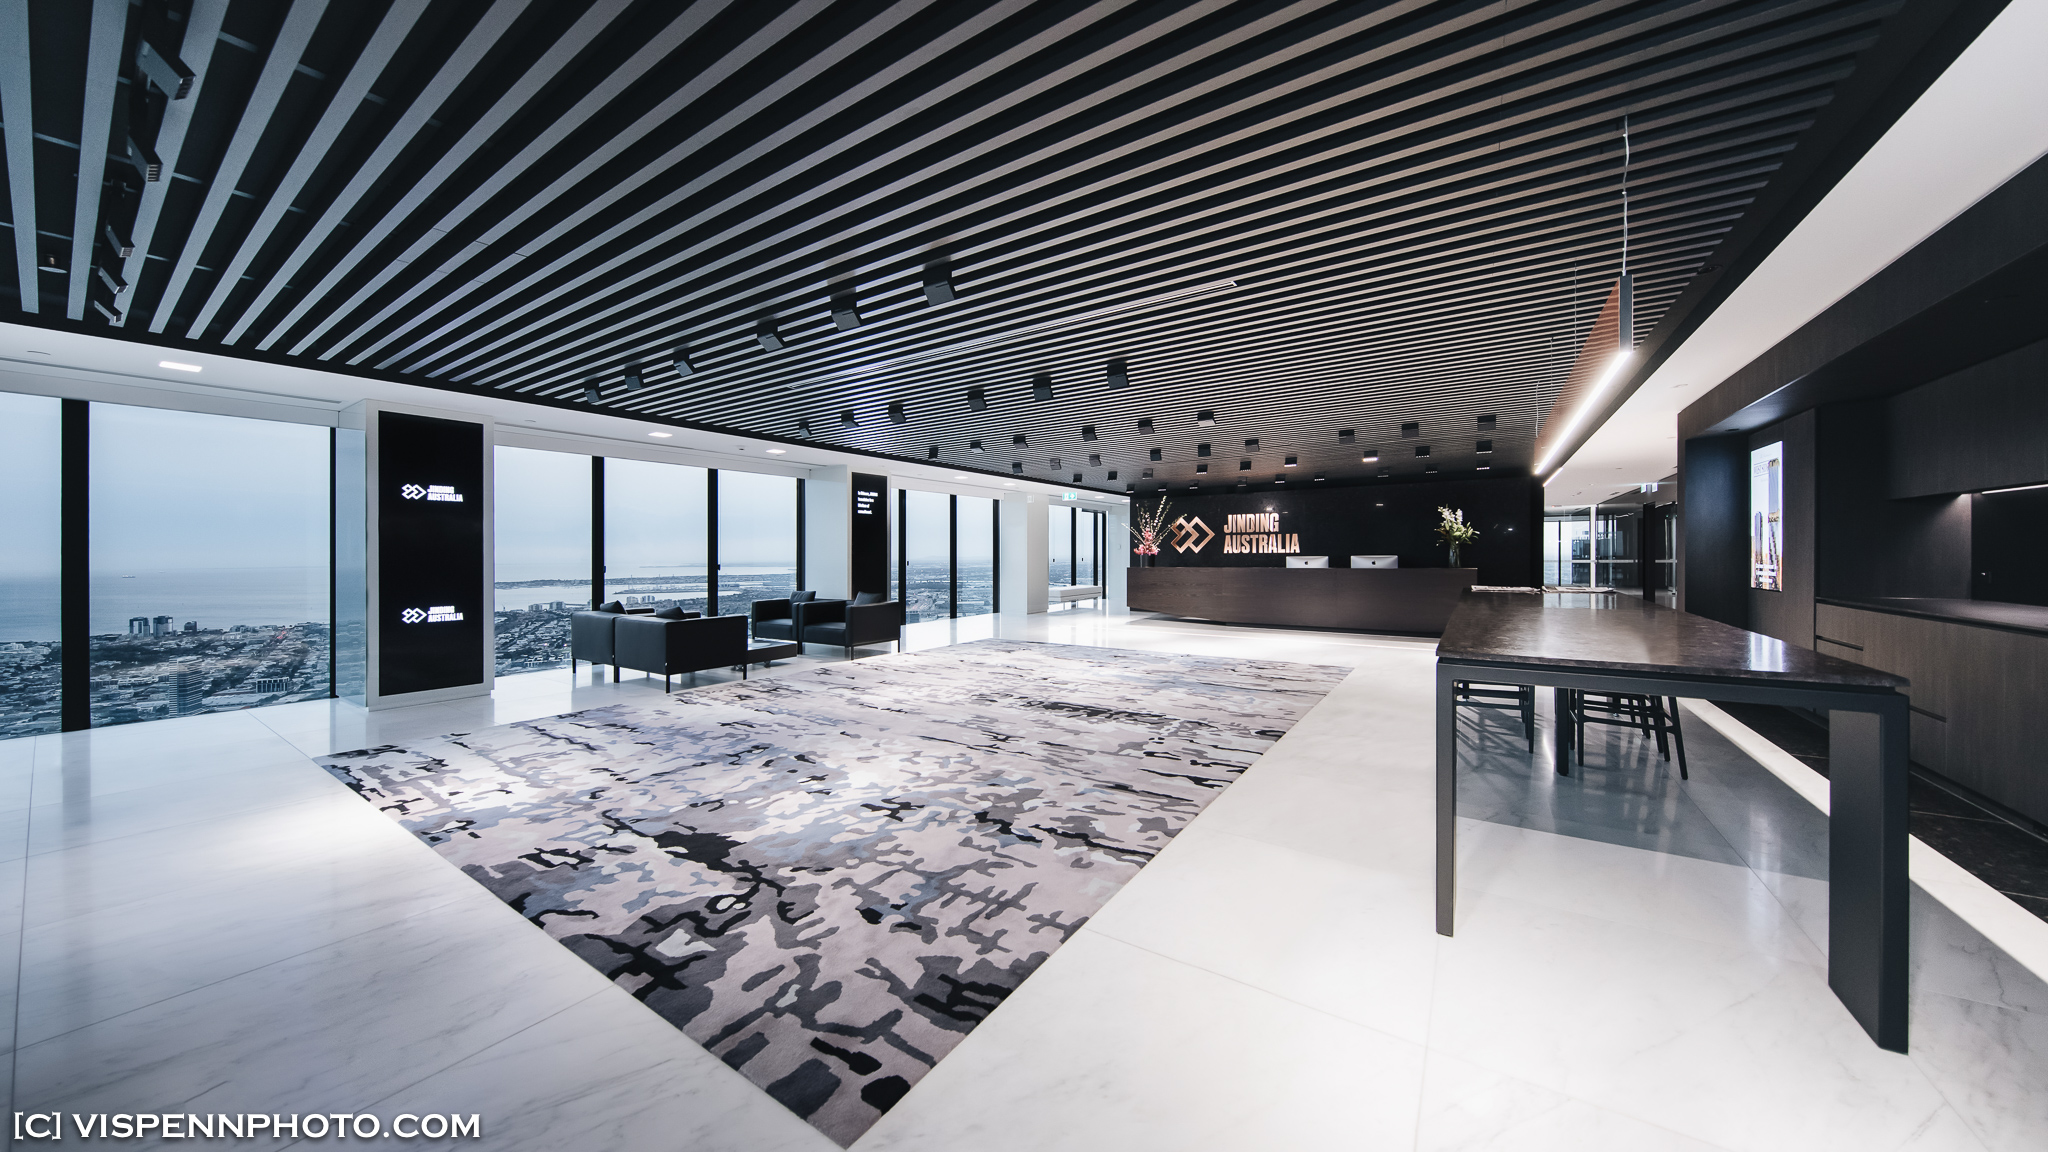 REAL ESTATE INTERIOR Photography Melbourne VISPENN 墨尔本 地产摄影 公寓拍摄 豪宅拍摄 VR远程看房 房产航拍 5D5 5768 Edit